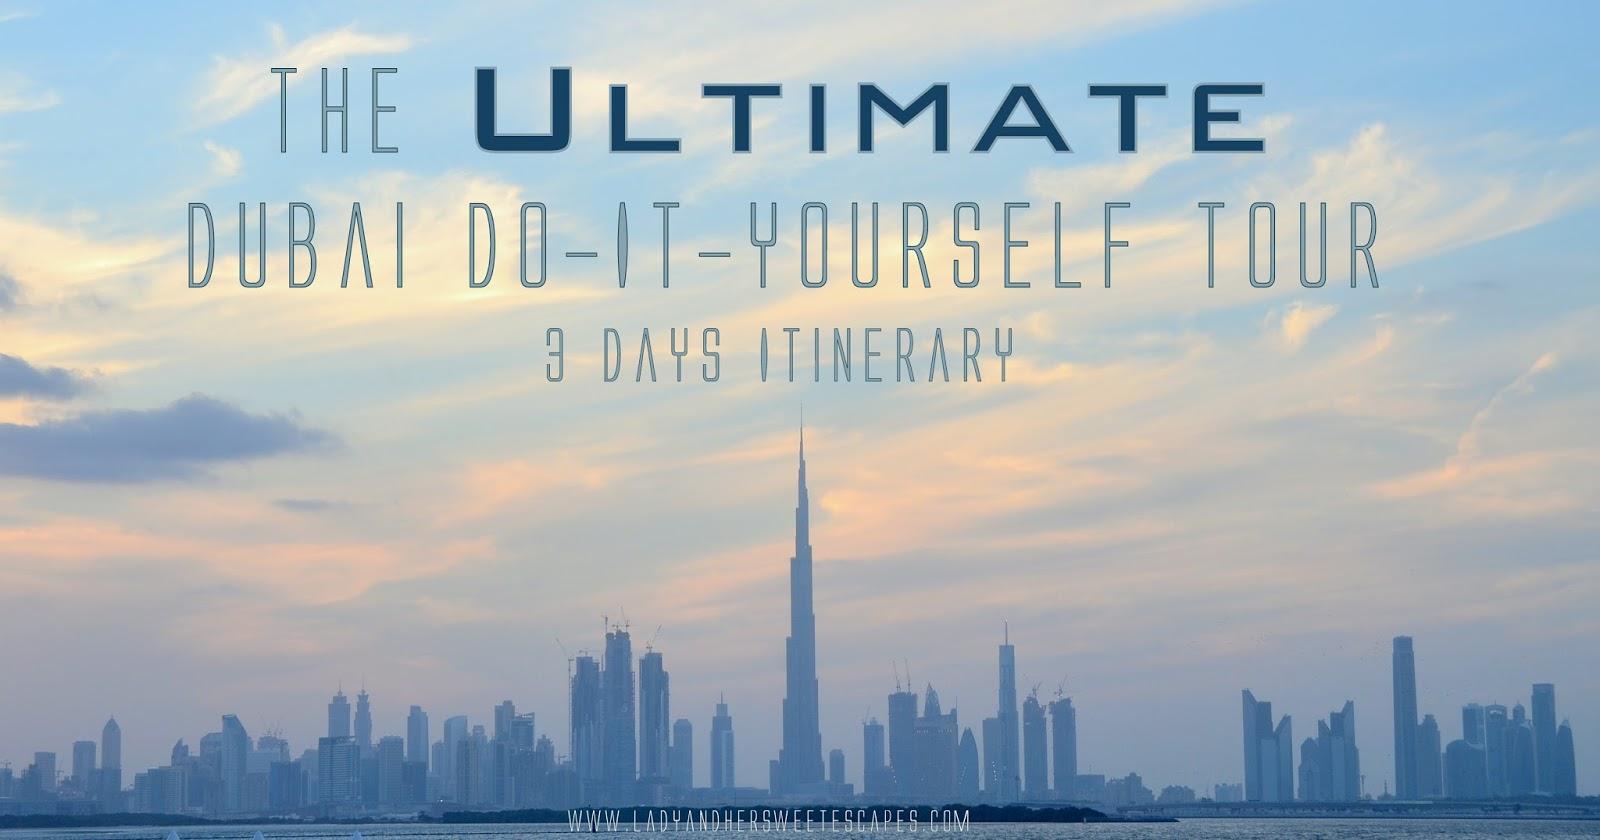 Dubai do it yourself tour 3 days itinerary lady her sweet escapes dubai diy tour solutioingenieria Images